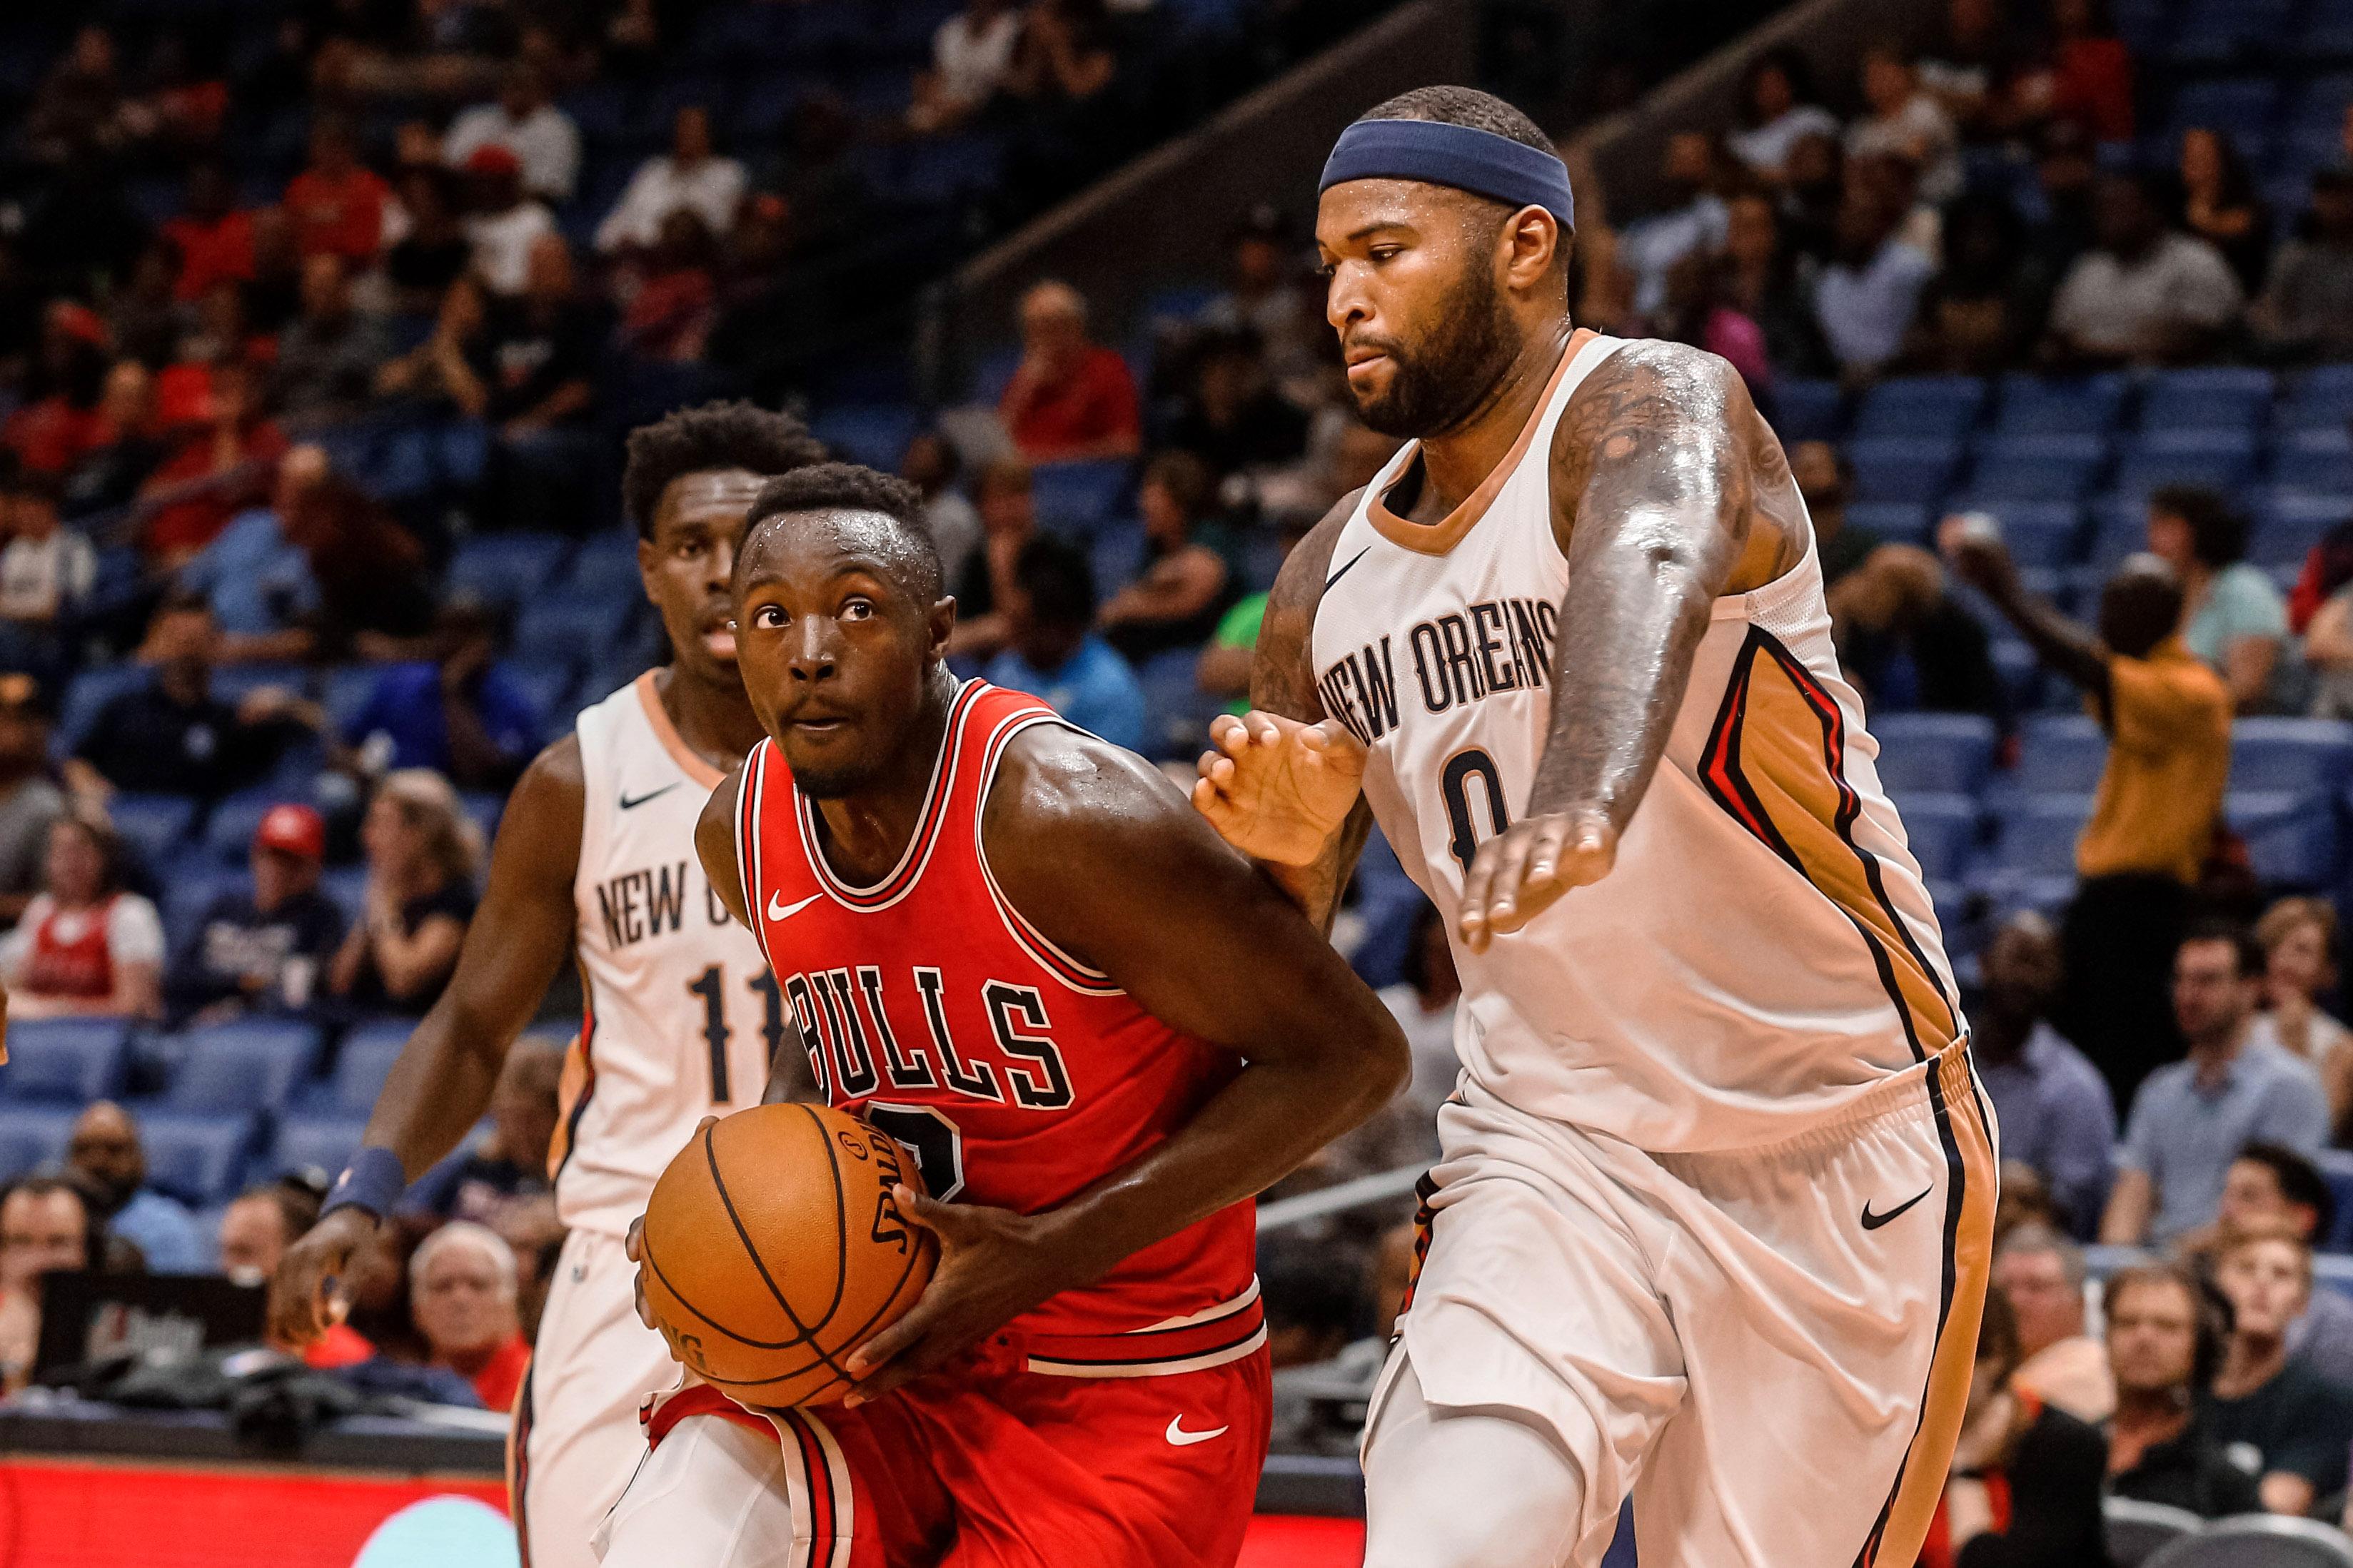 NBA: Preseason-Chicago Bulls at New Orleans Pelicans